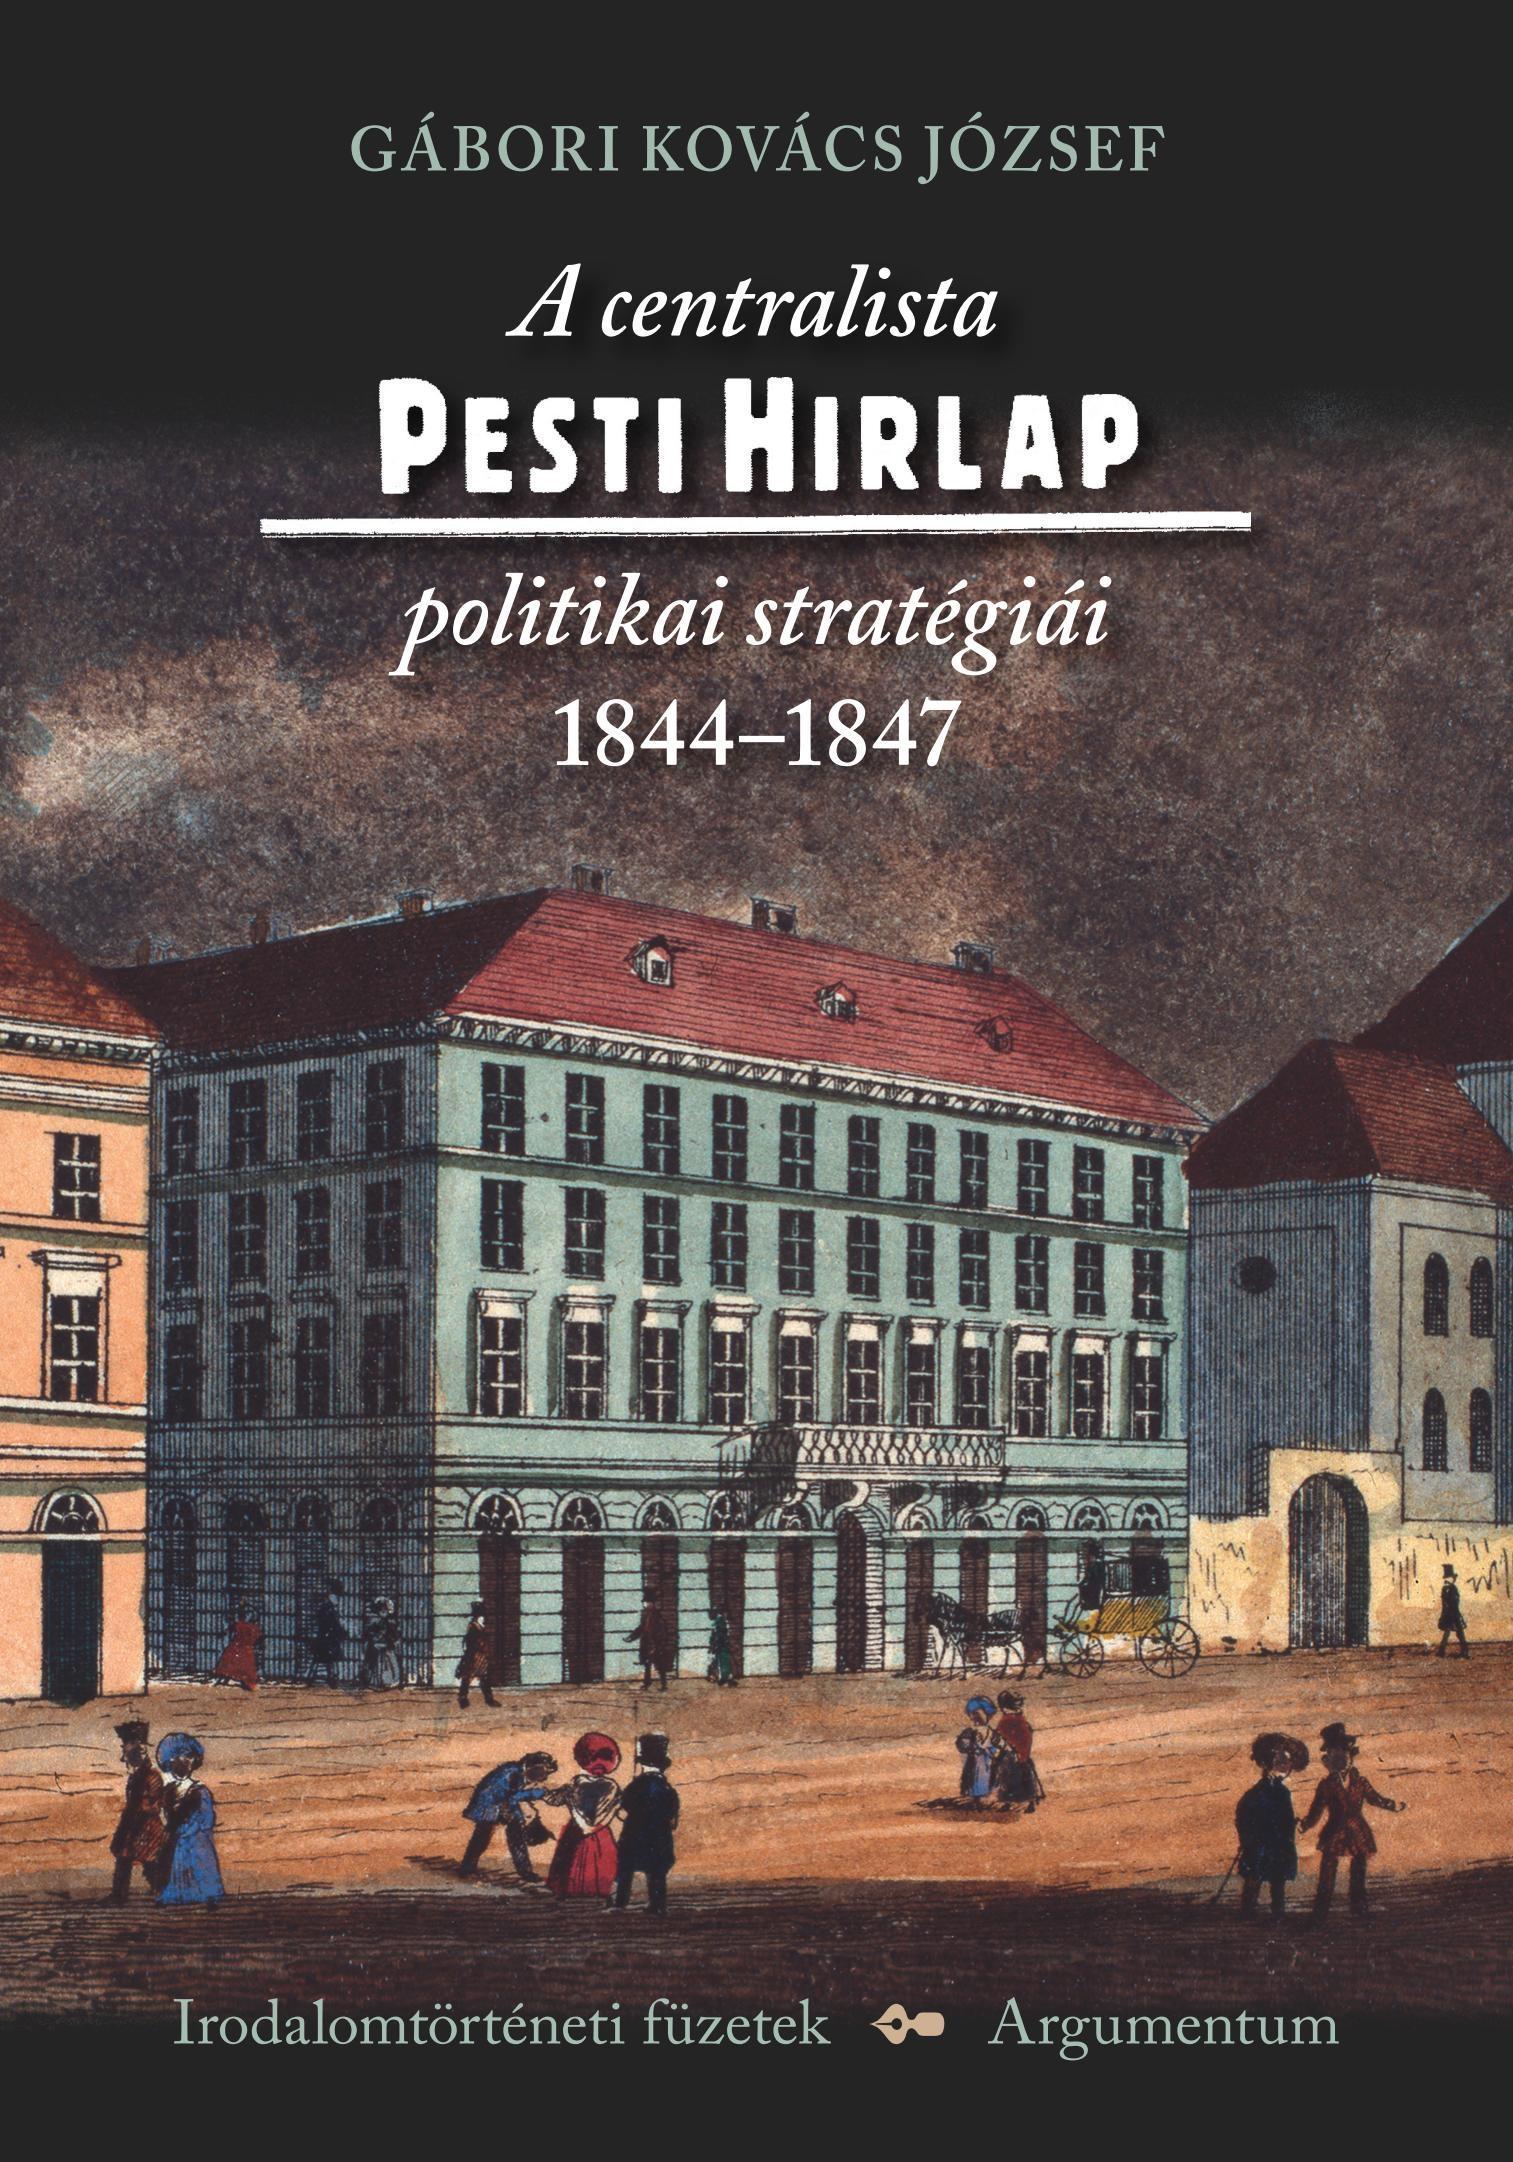 A CENTRALISTA PESTI HIRLAP POLITIKAI STRATÉGIÁI 1844-1847